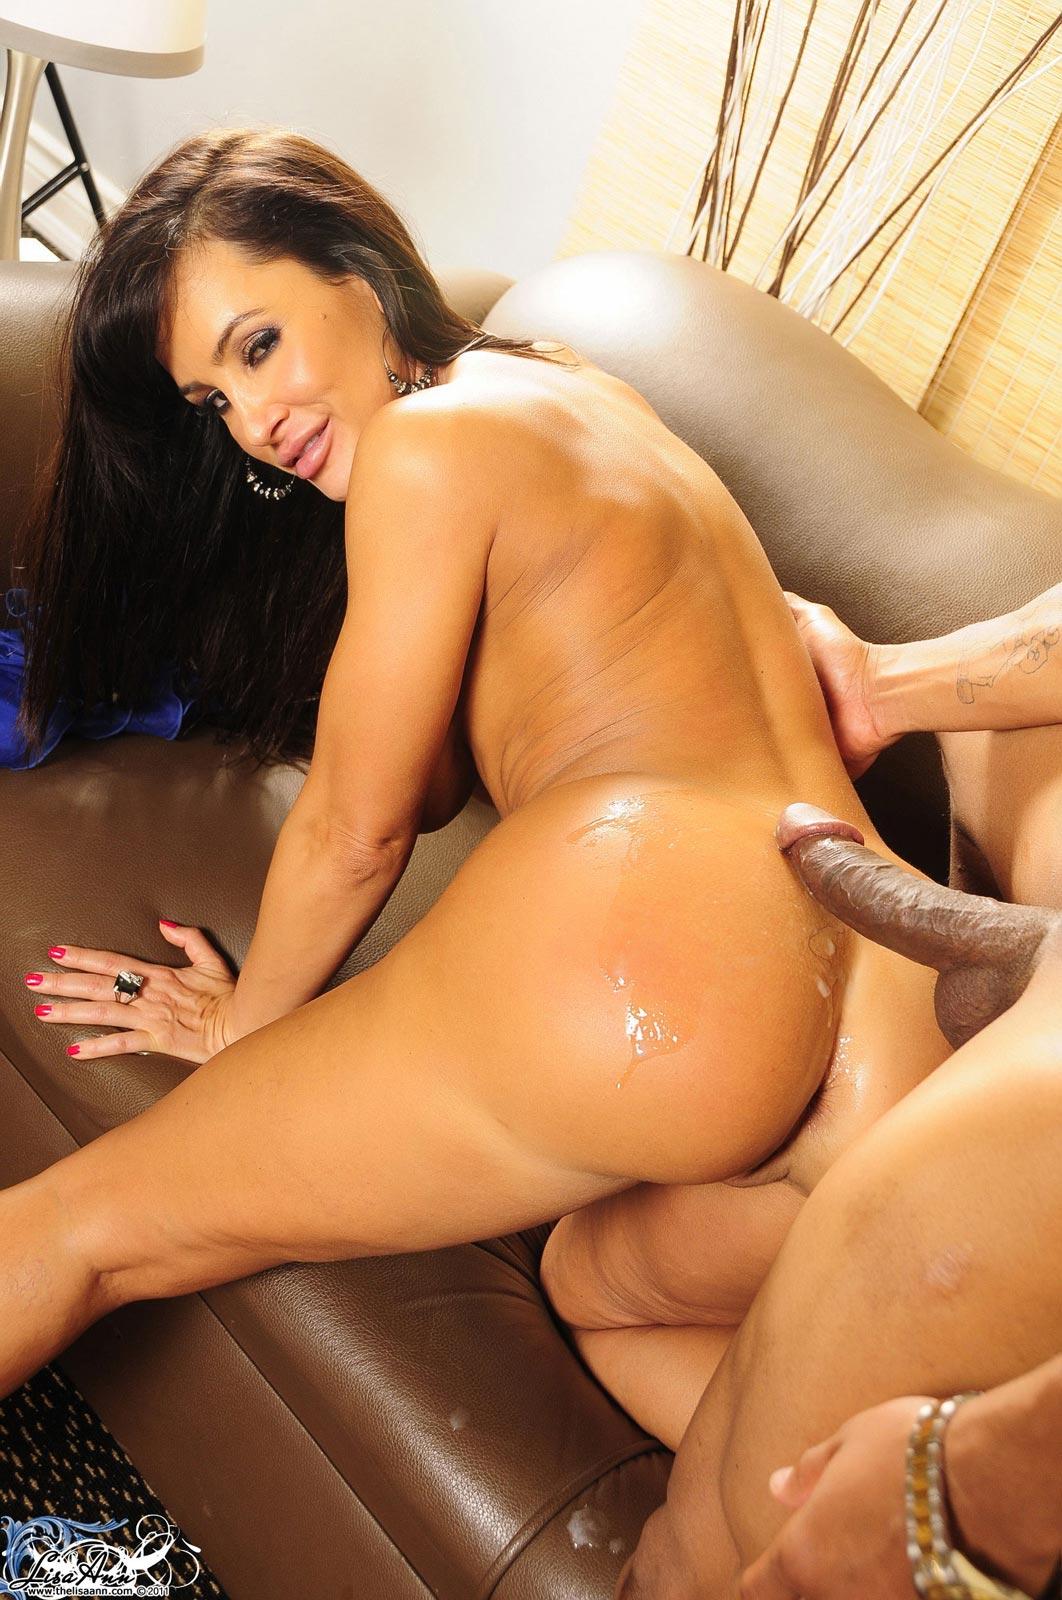 Porn Lisa Ann Pic lisa ann 1st porn | free download nude photo gallery